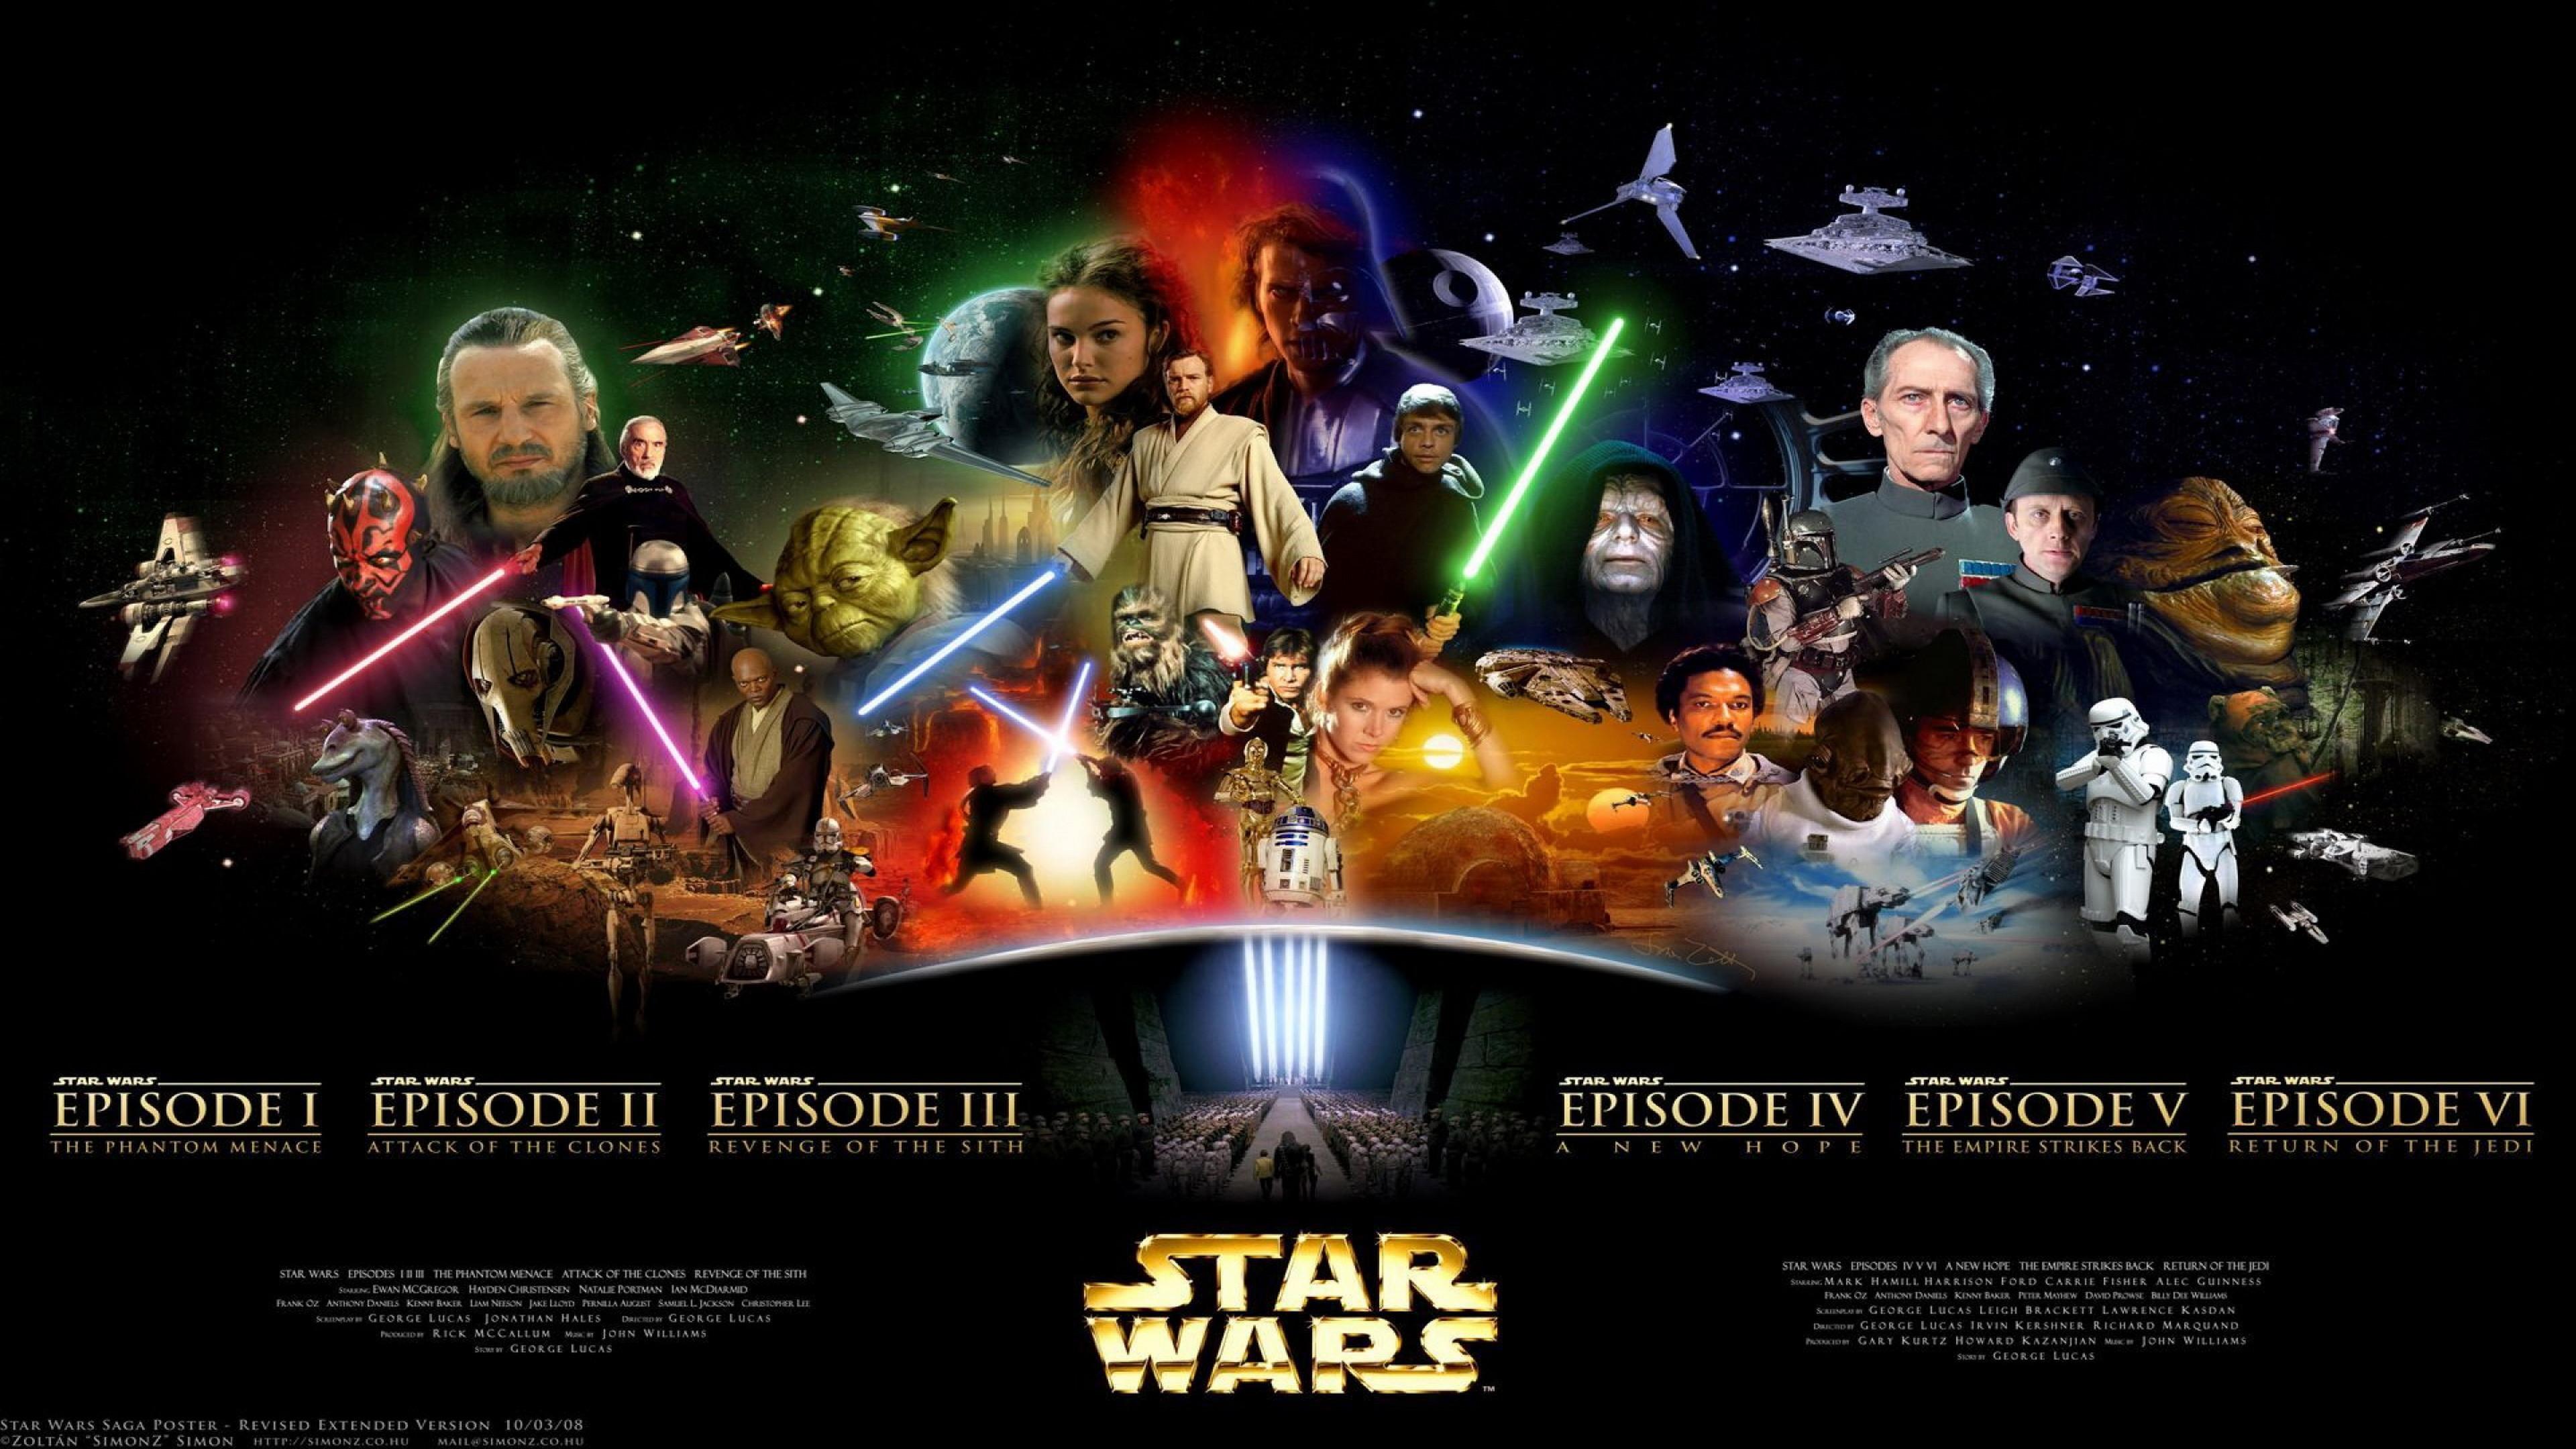 Star Wars Ultra HD 4k Wallpaper – HD Wallpapers, Ultra HD Wallpapers